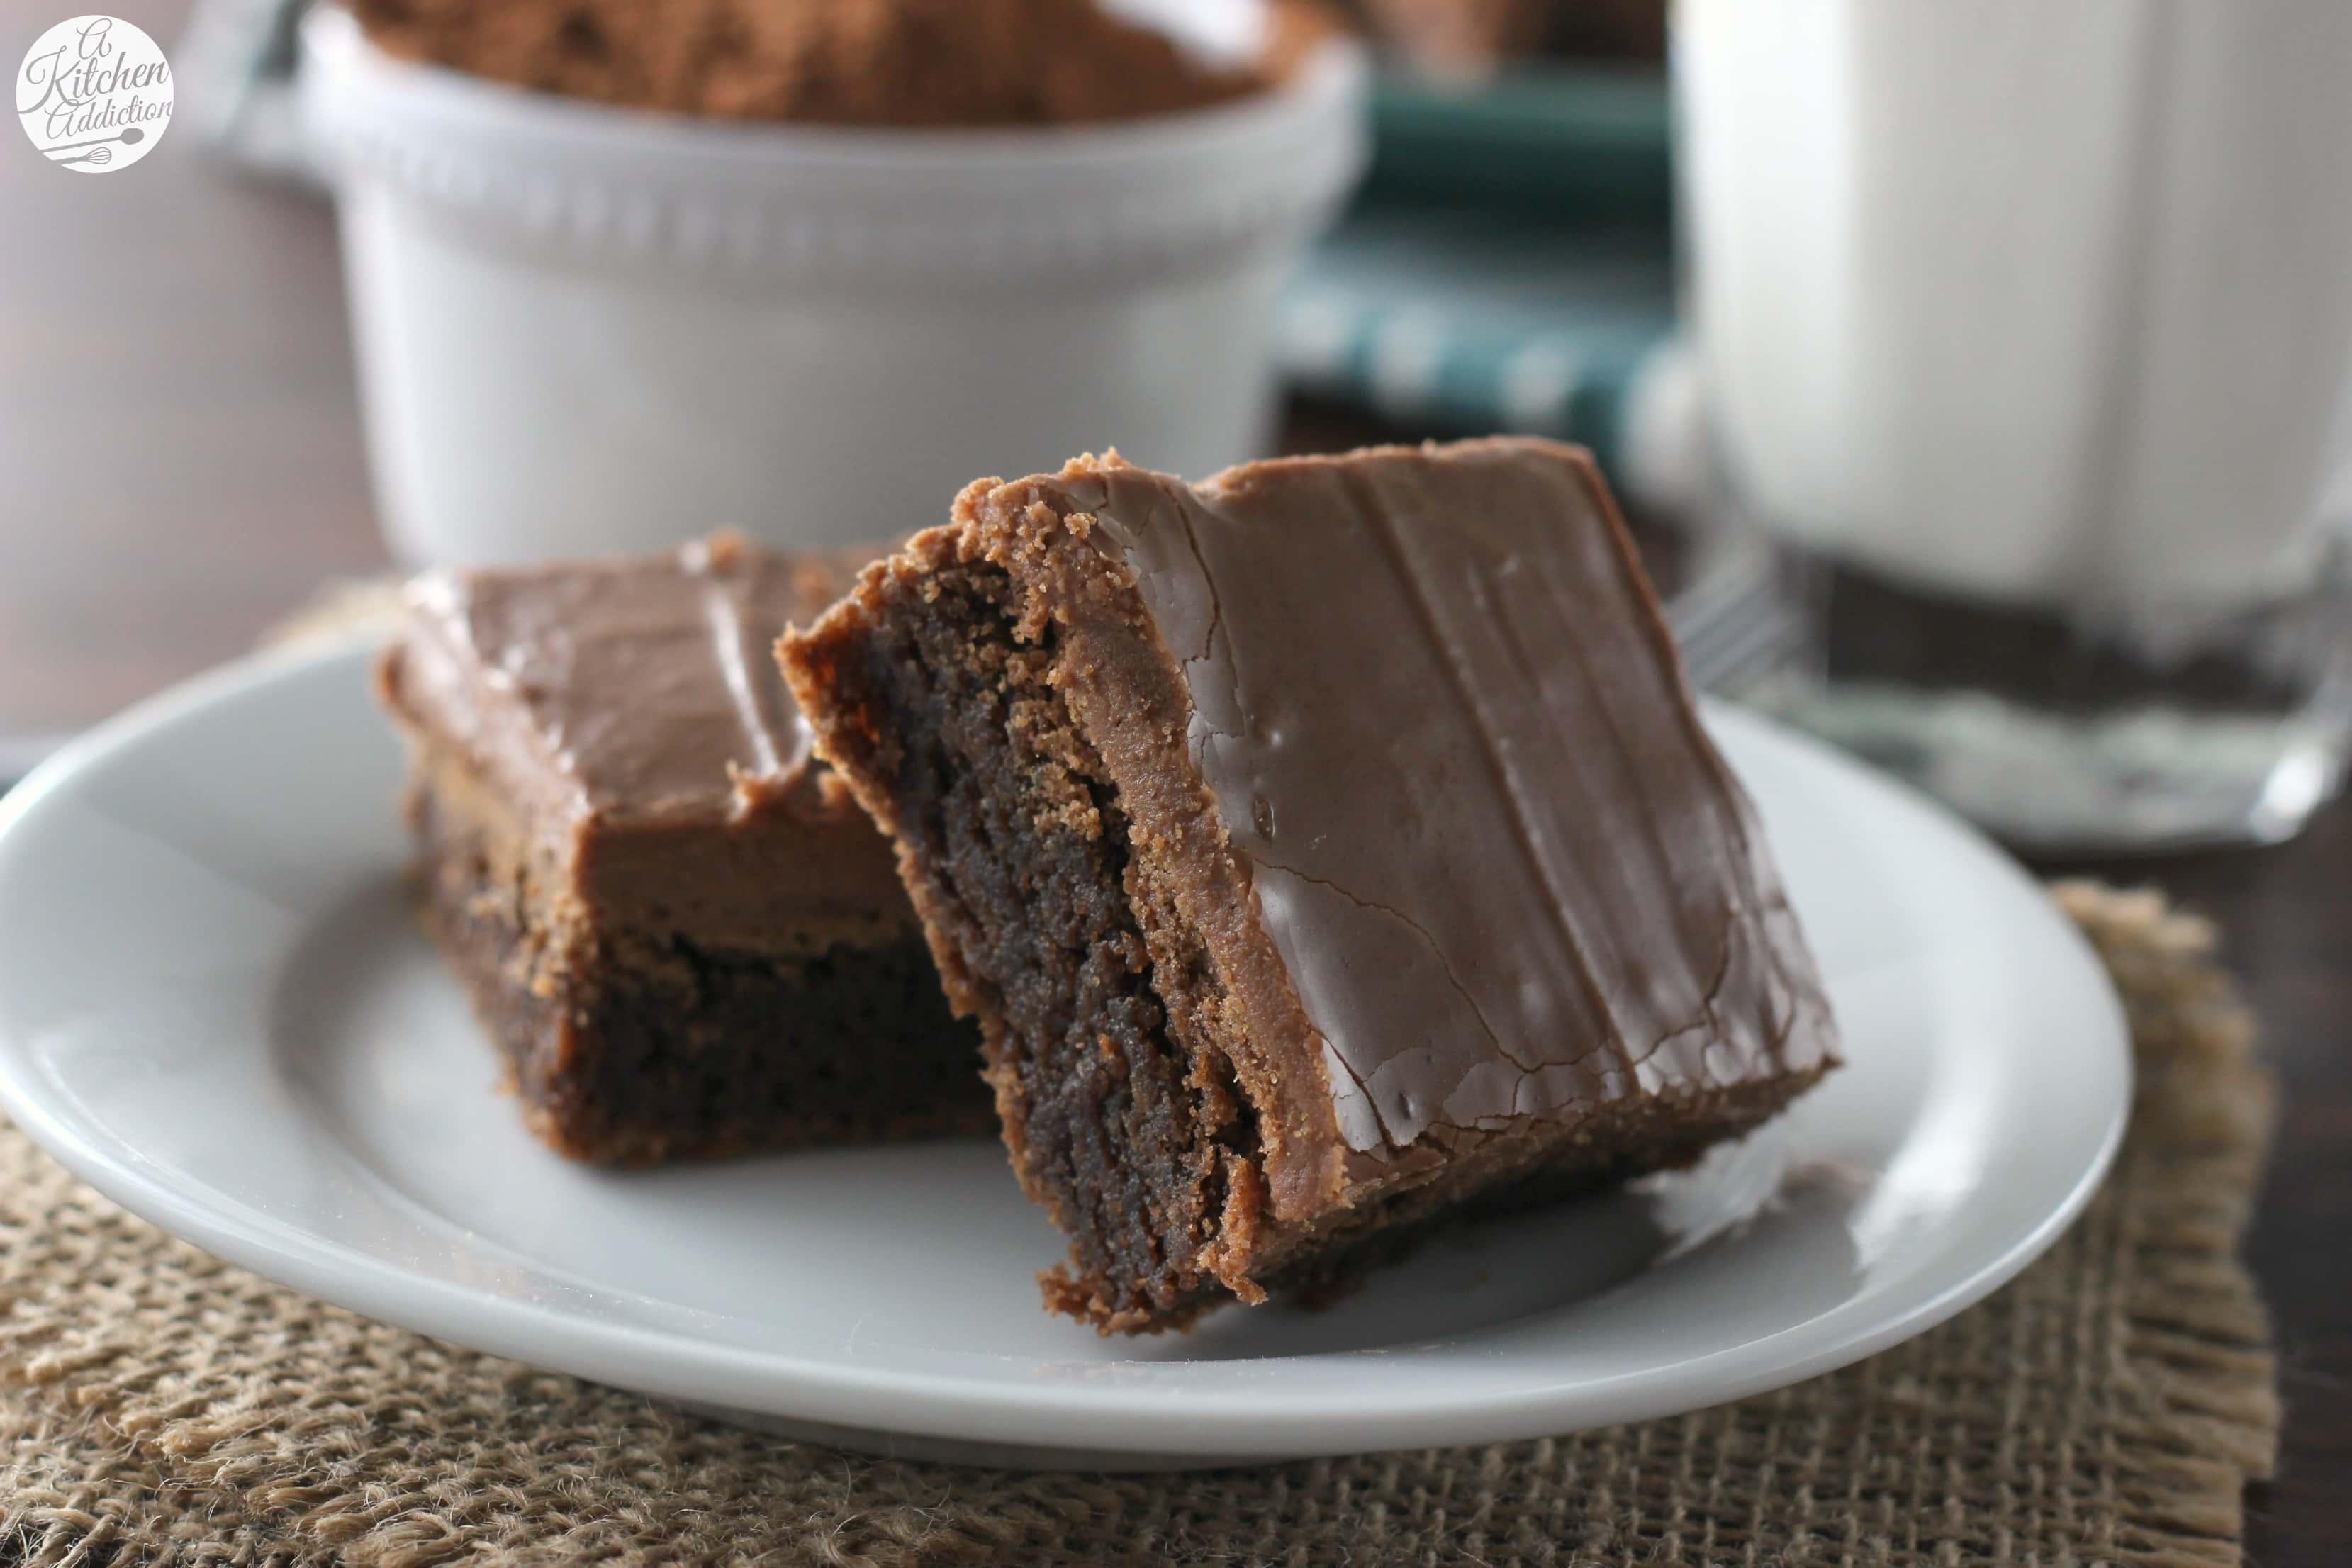 Buttermilk brownies a kitchen addiction for A kitchen addiction